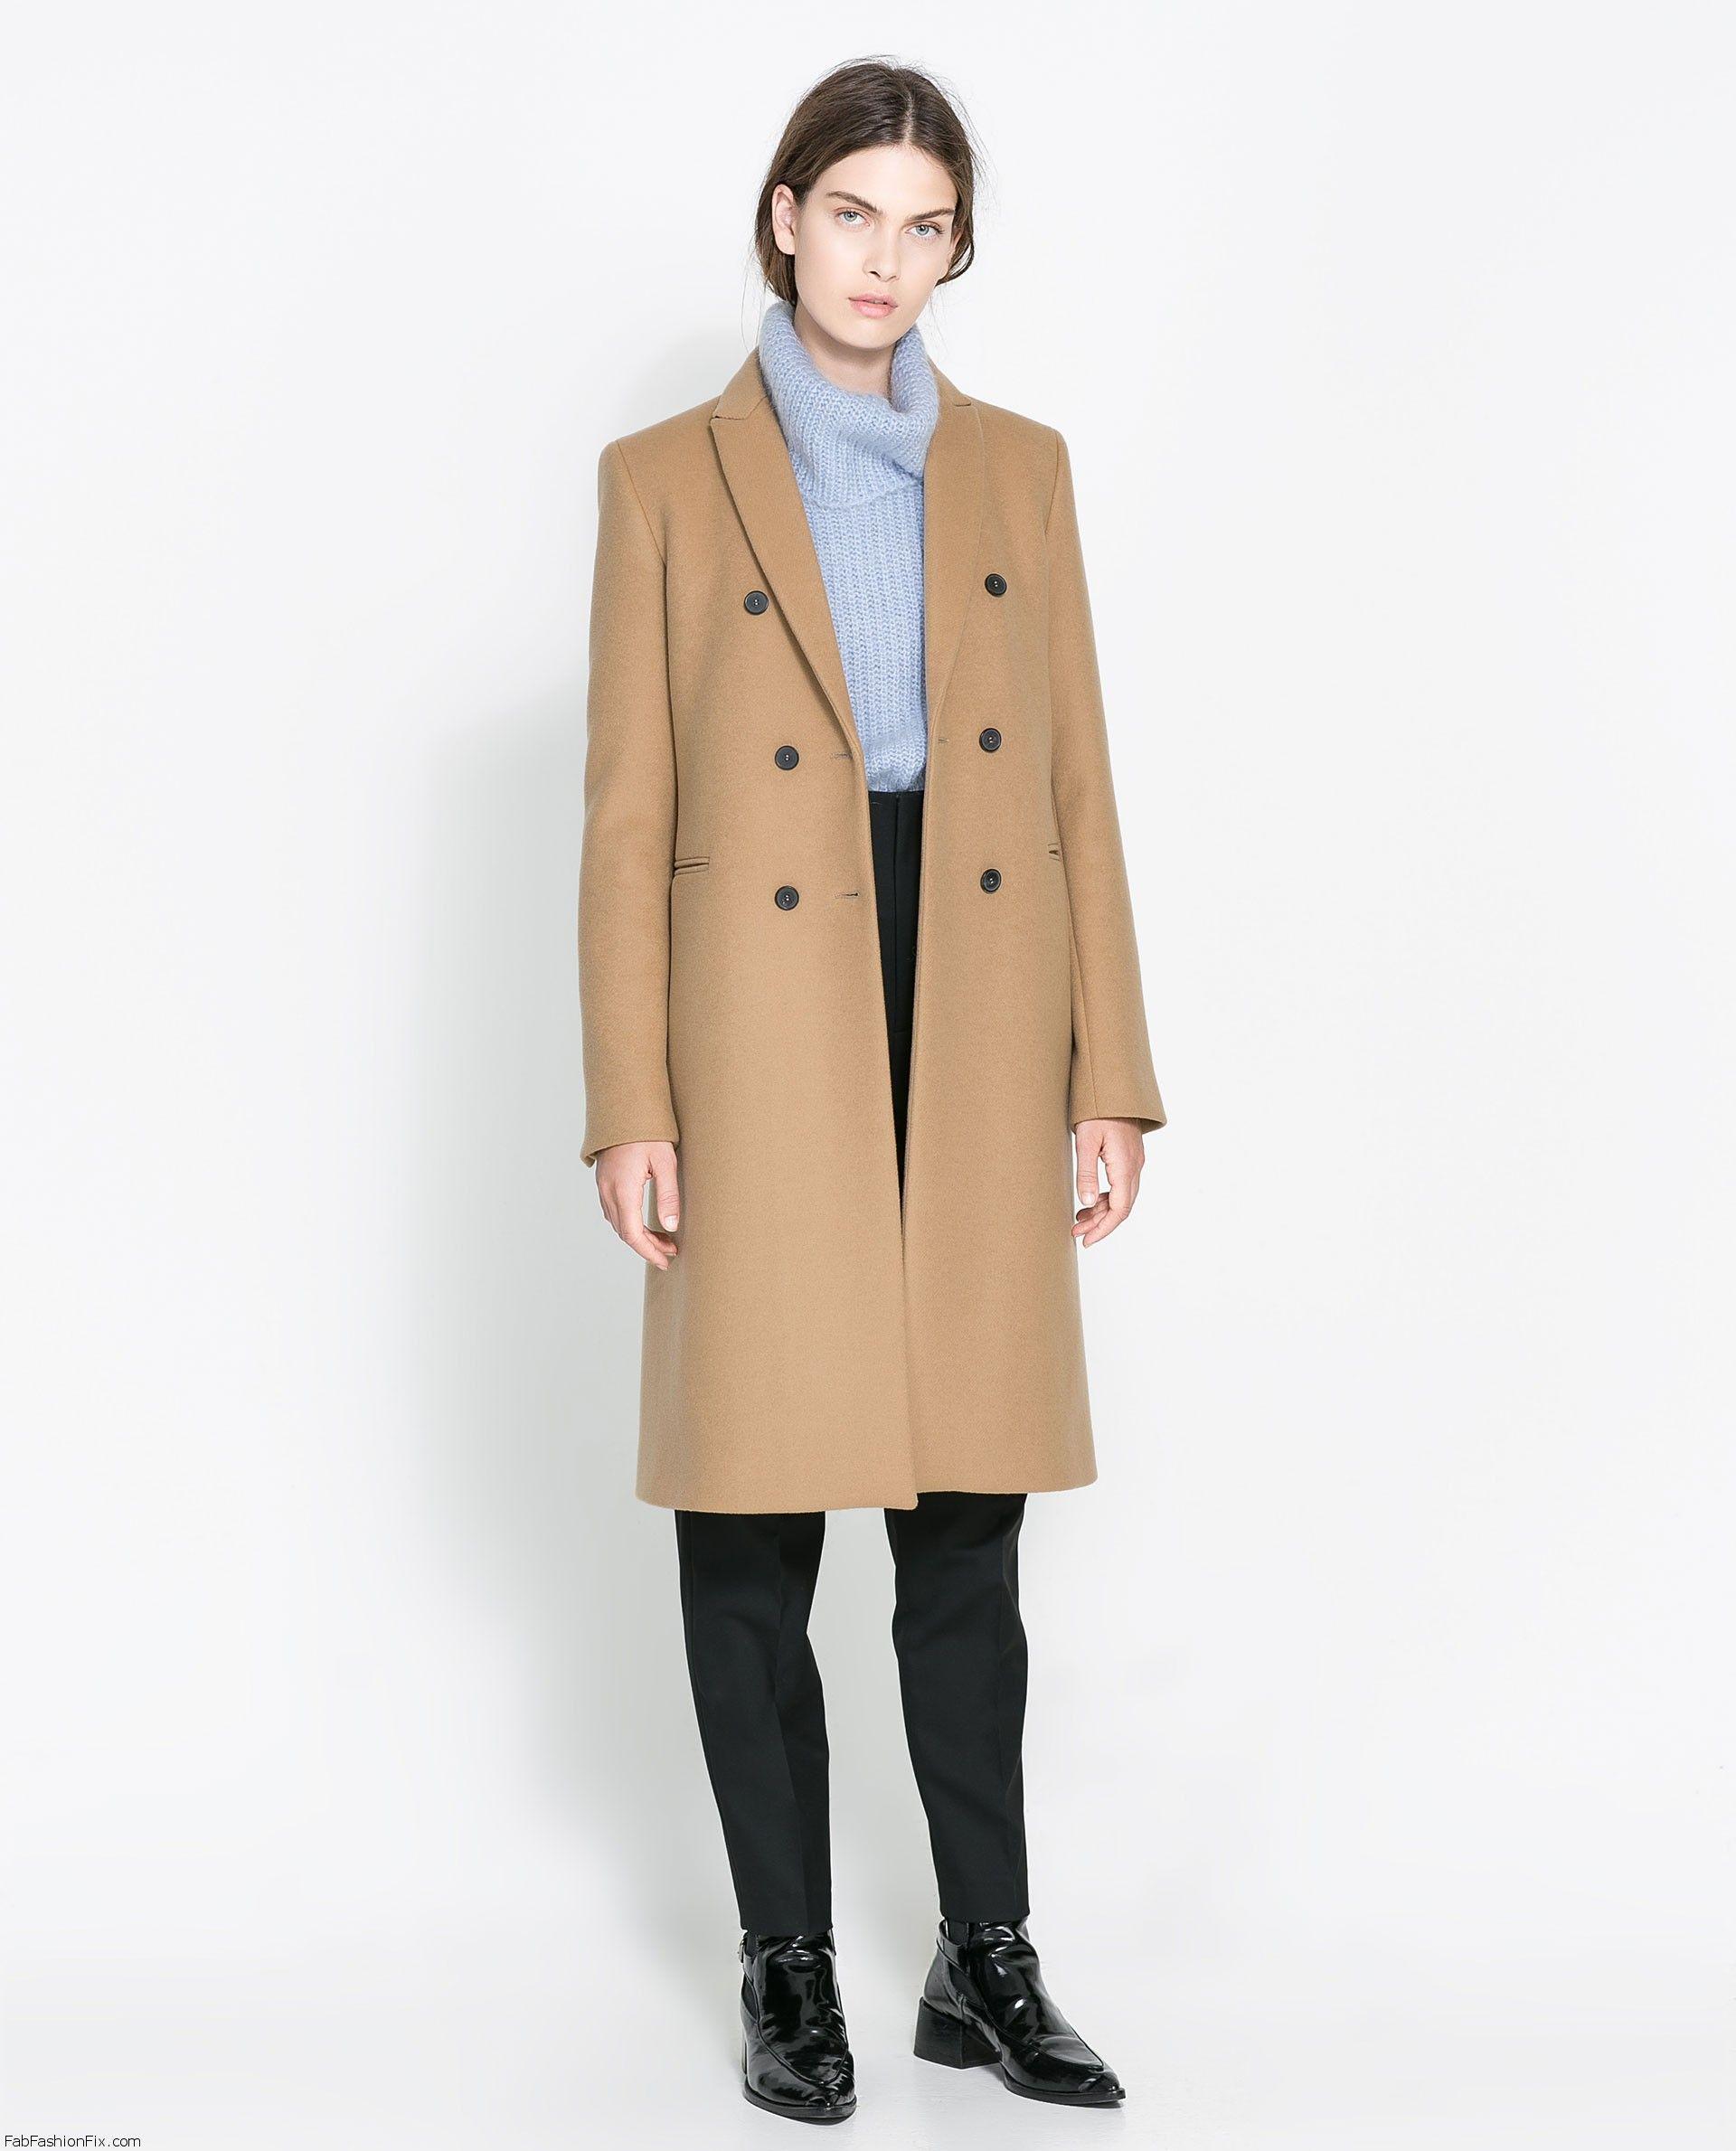 Zara Coats Jackets For Fall Winter 2013 Fab Fashion Fix Zara Coat Coat Double Breasted Coat [ 2379 x 1920 Pixel ]